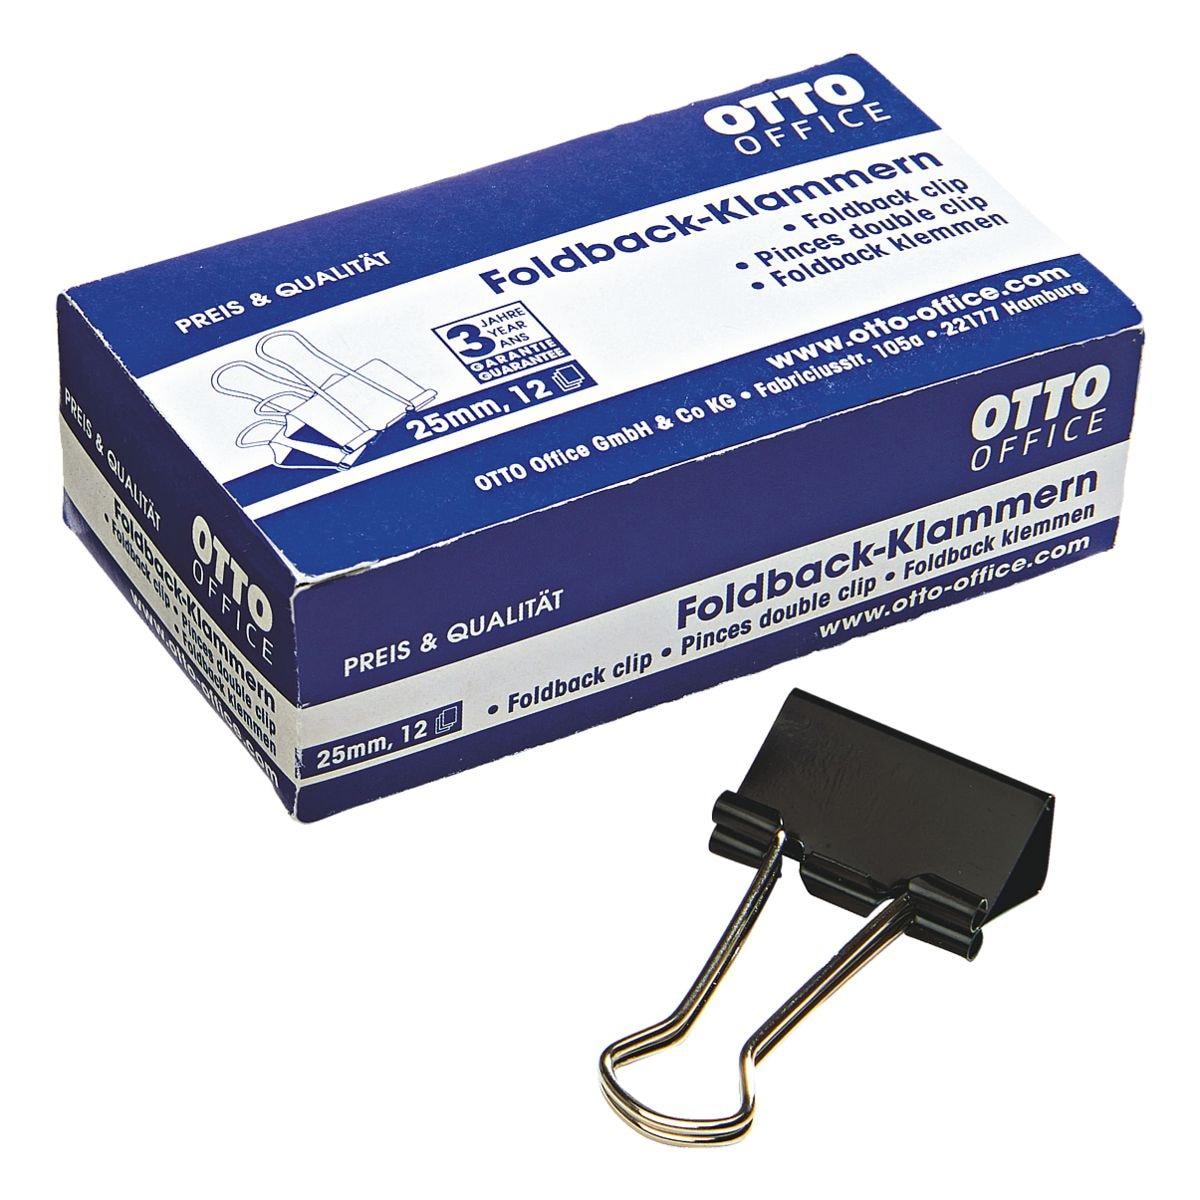 OTTO Office Foldback-Klammern 25mm, schwarz, 12 Stück